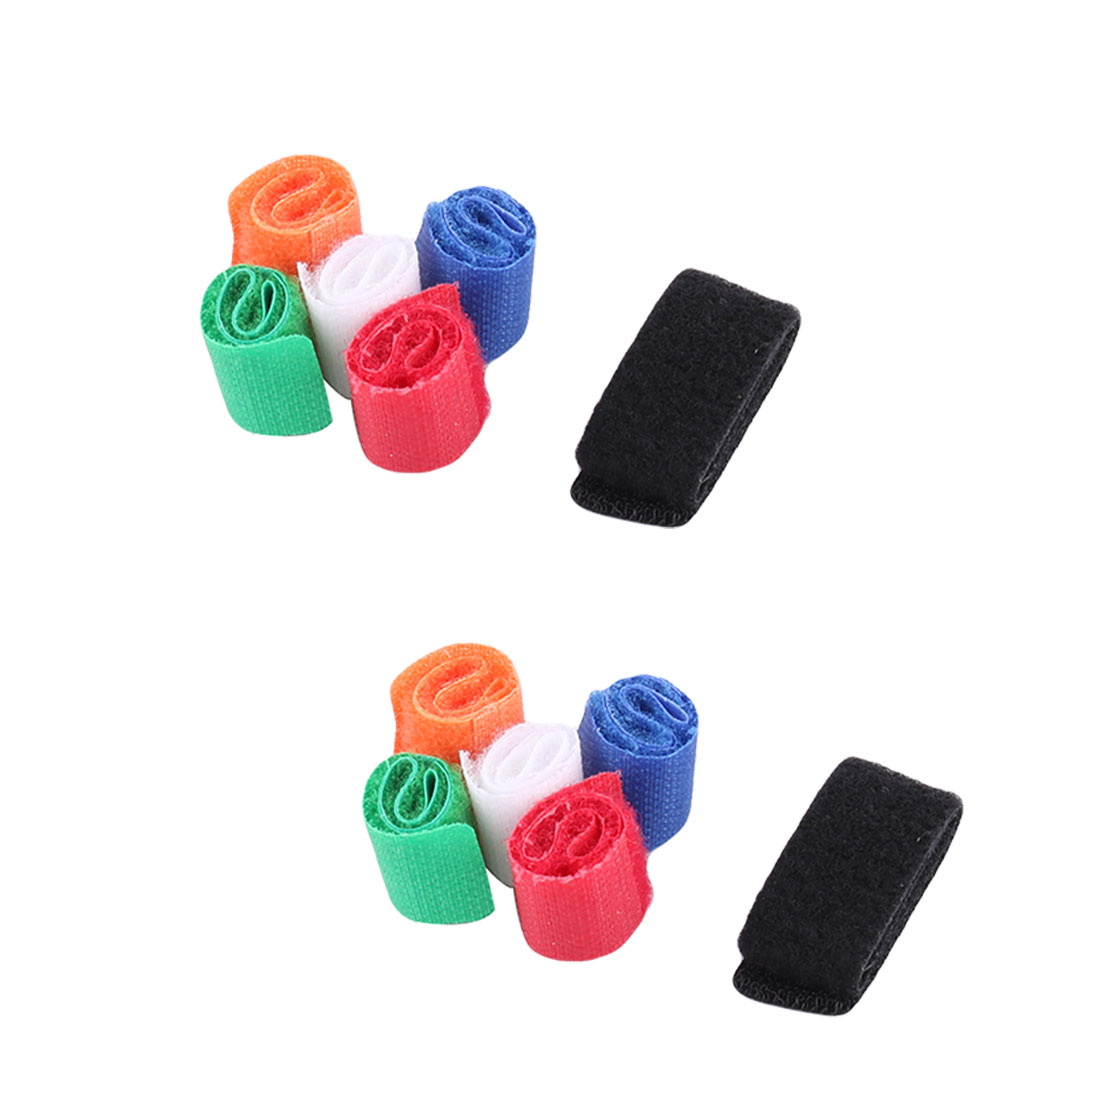 Unique Bargains Home Nylon Self-adhesive Management Strap Ties Fastener Hook Loop Tape 12 Pcs